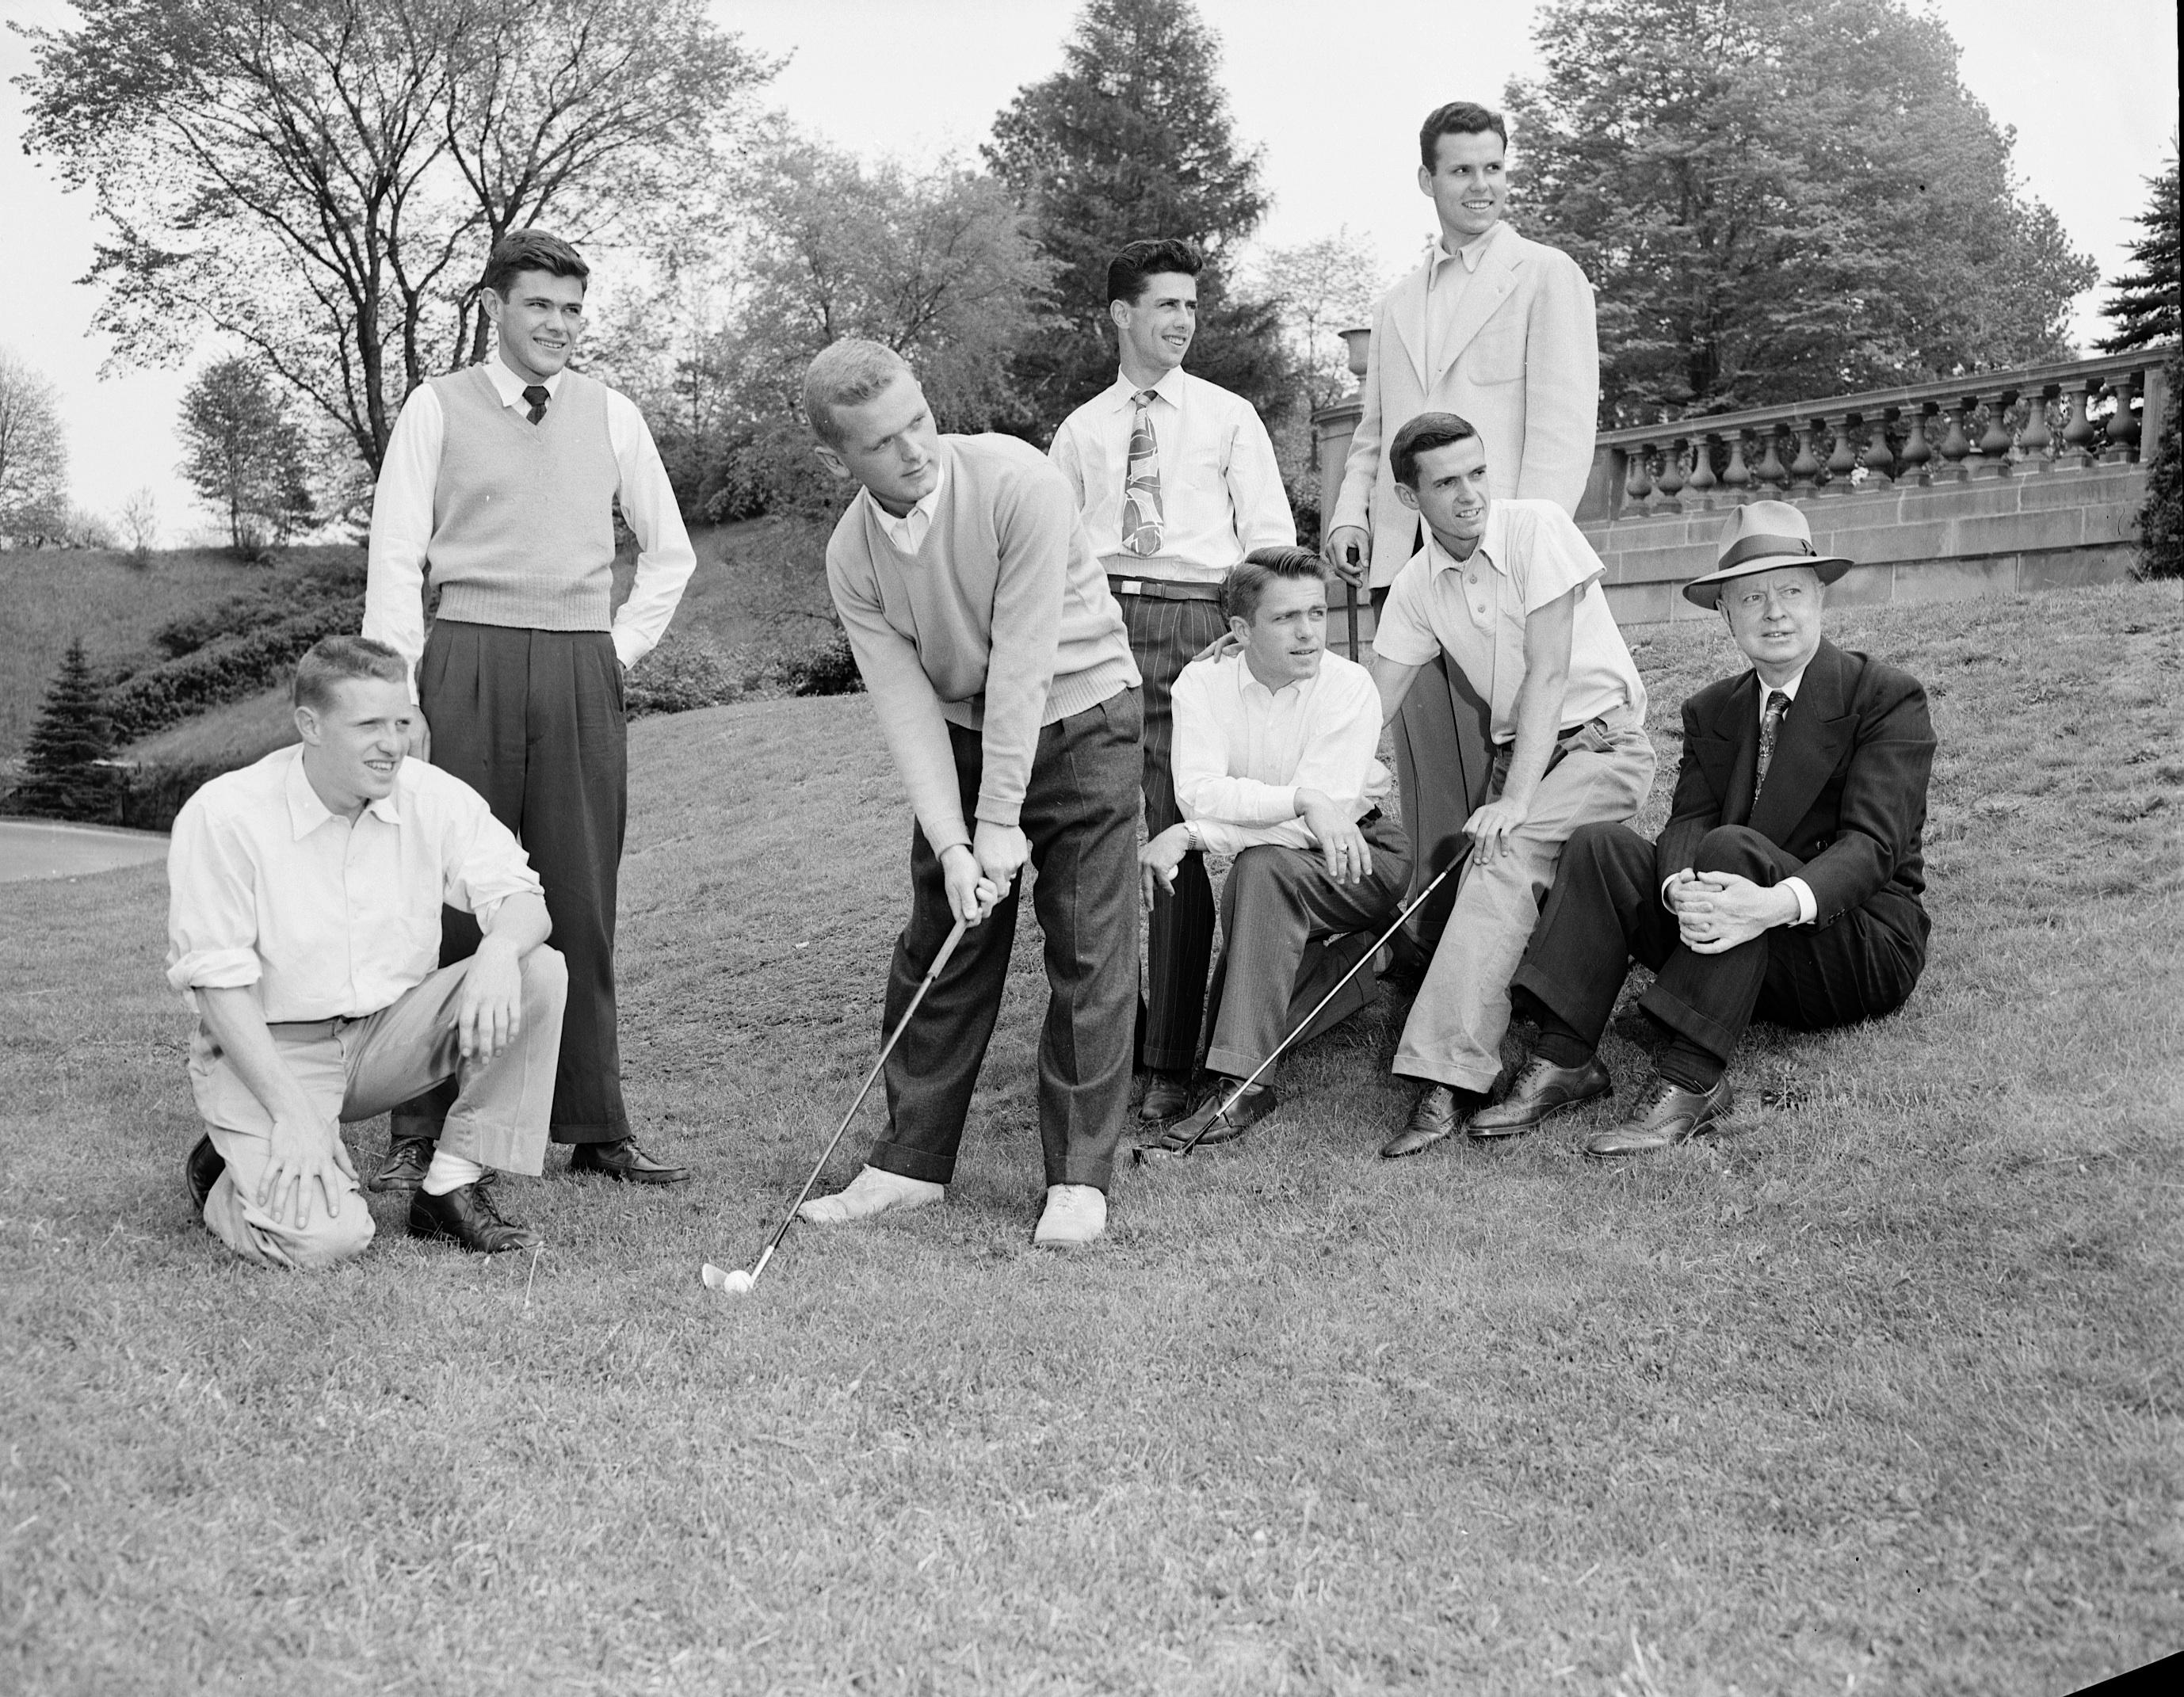 Golfers (May 23, 24, 1950) G 174B